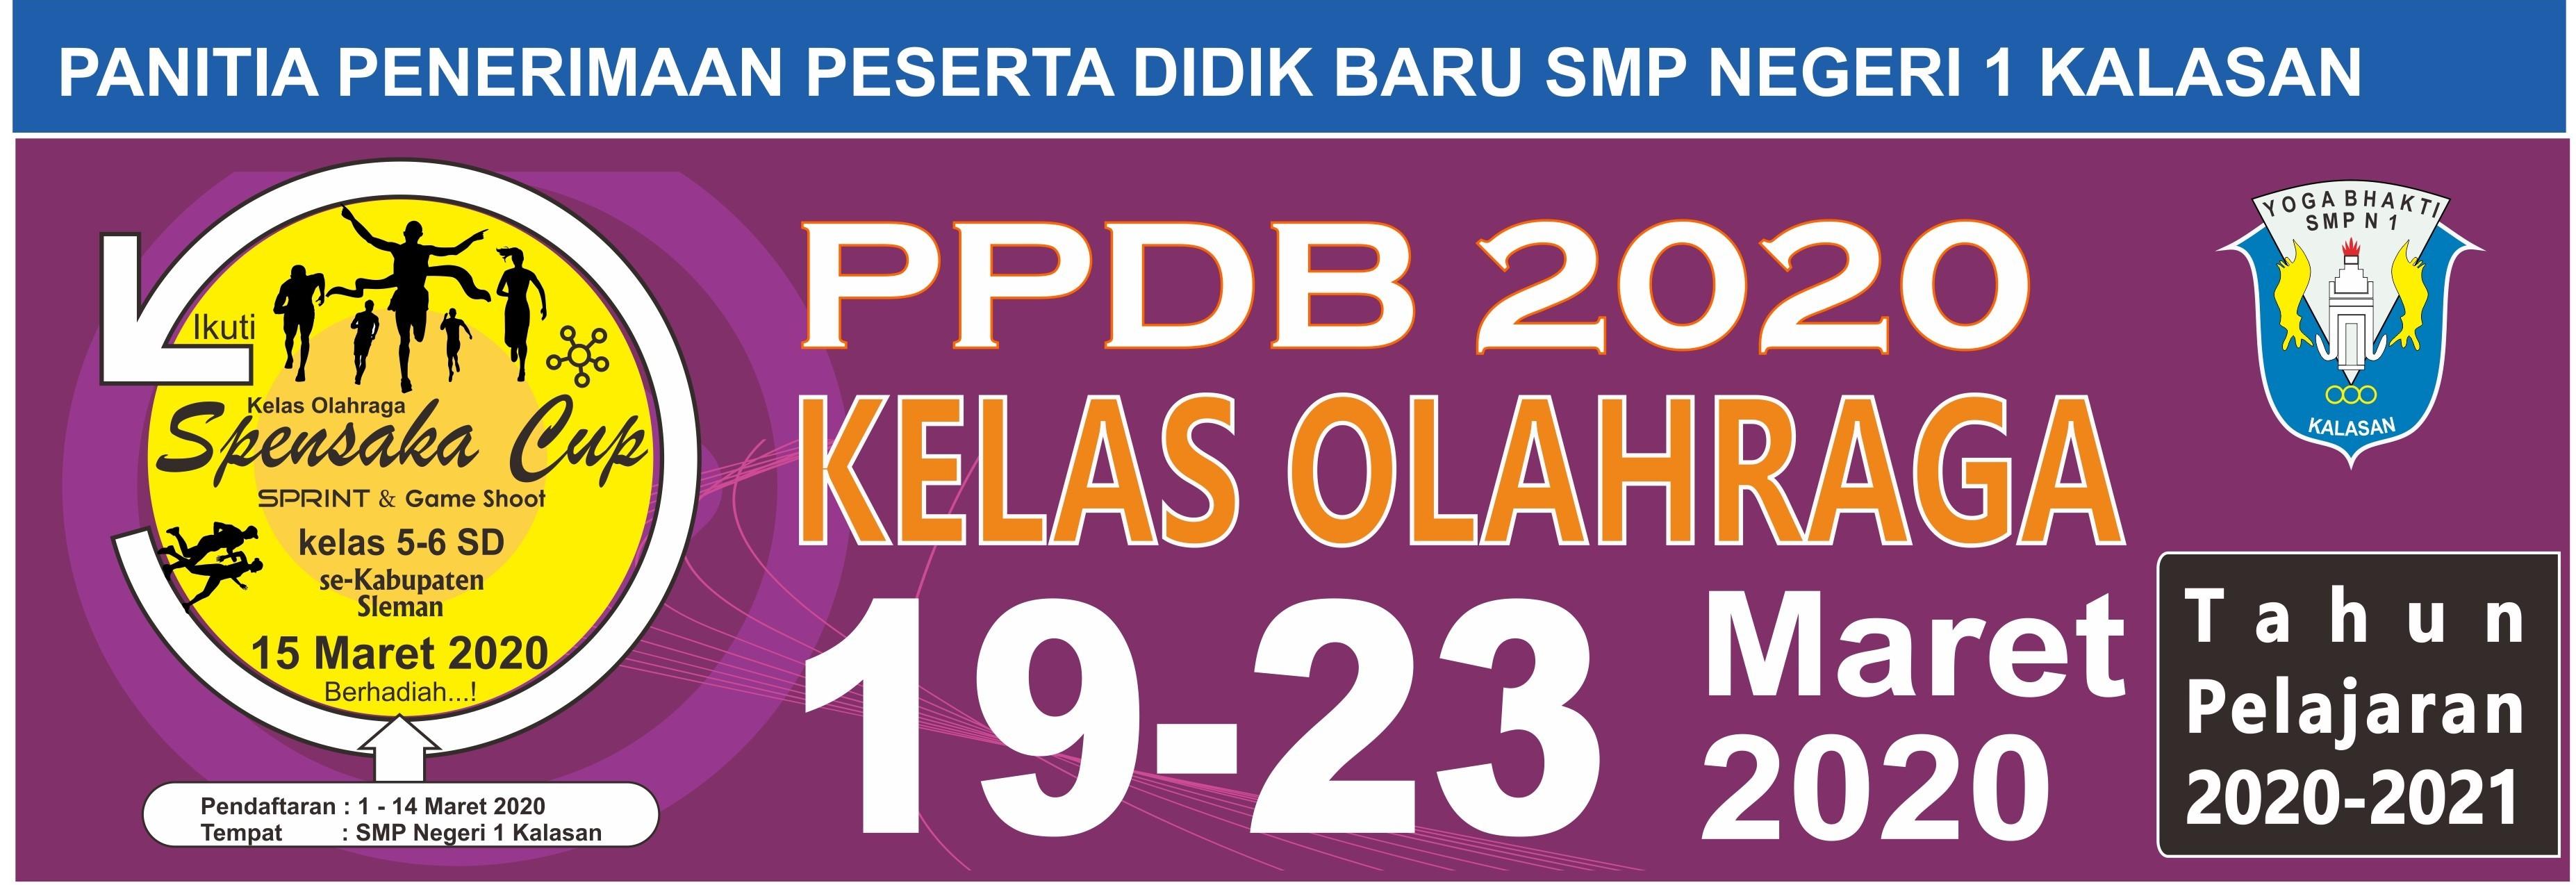 Poster_PPDB_KKO_2020_A3_Kls_c.jpg